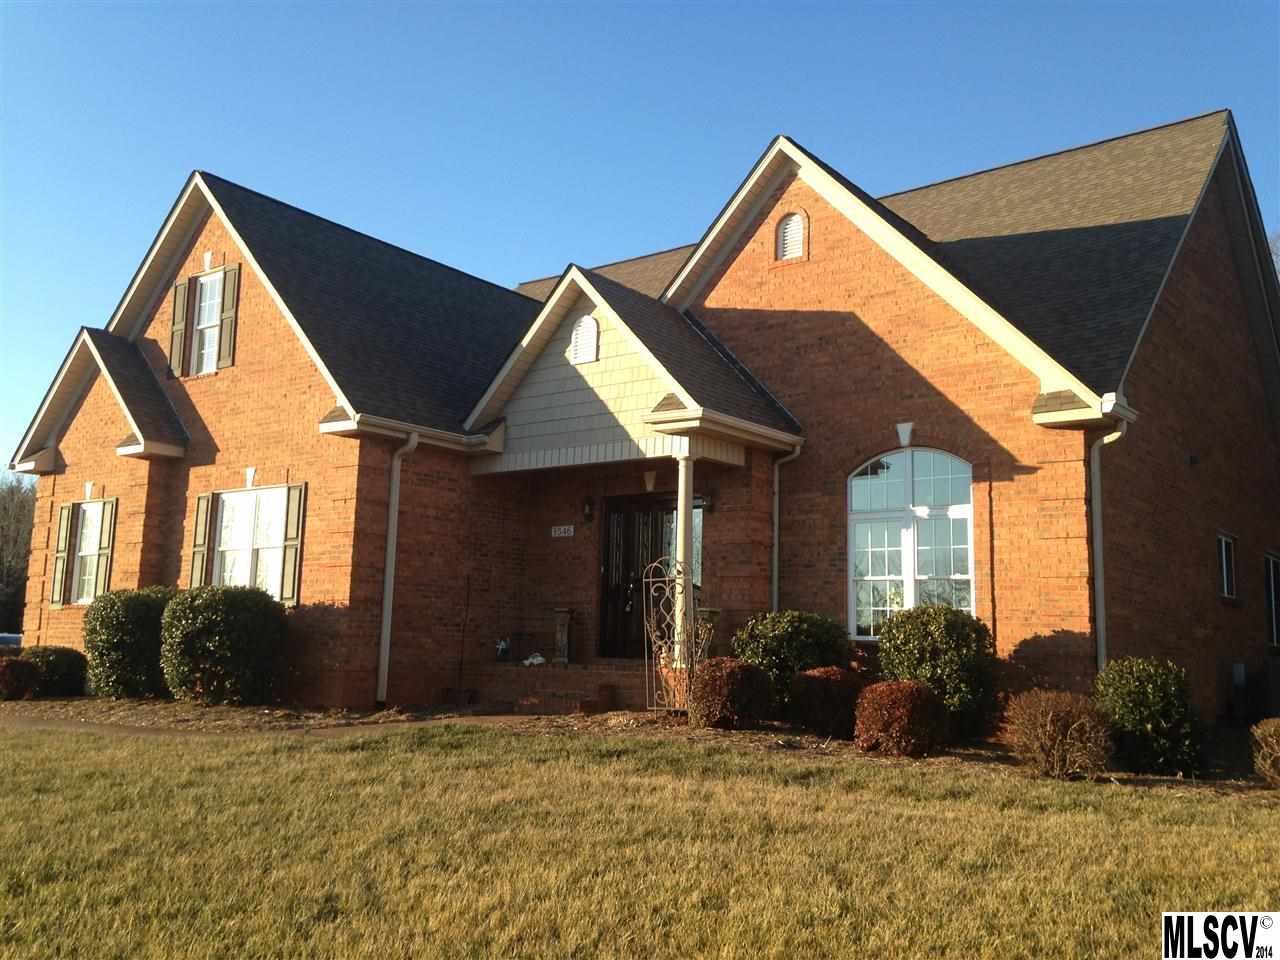 Real Estate for Sale, ListingId: 30113382, Claremont,NC28610